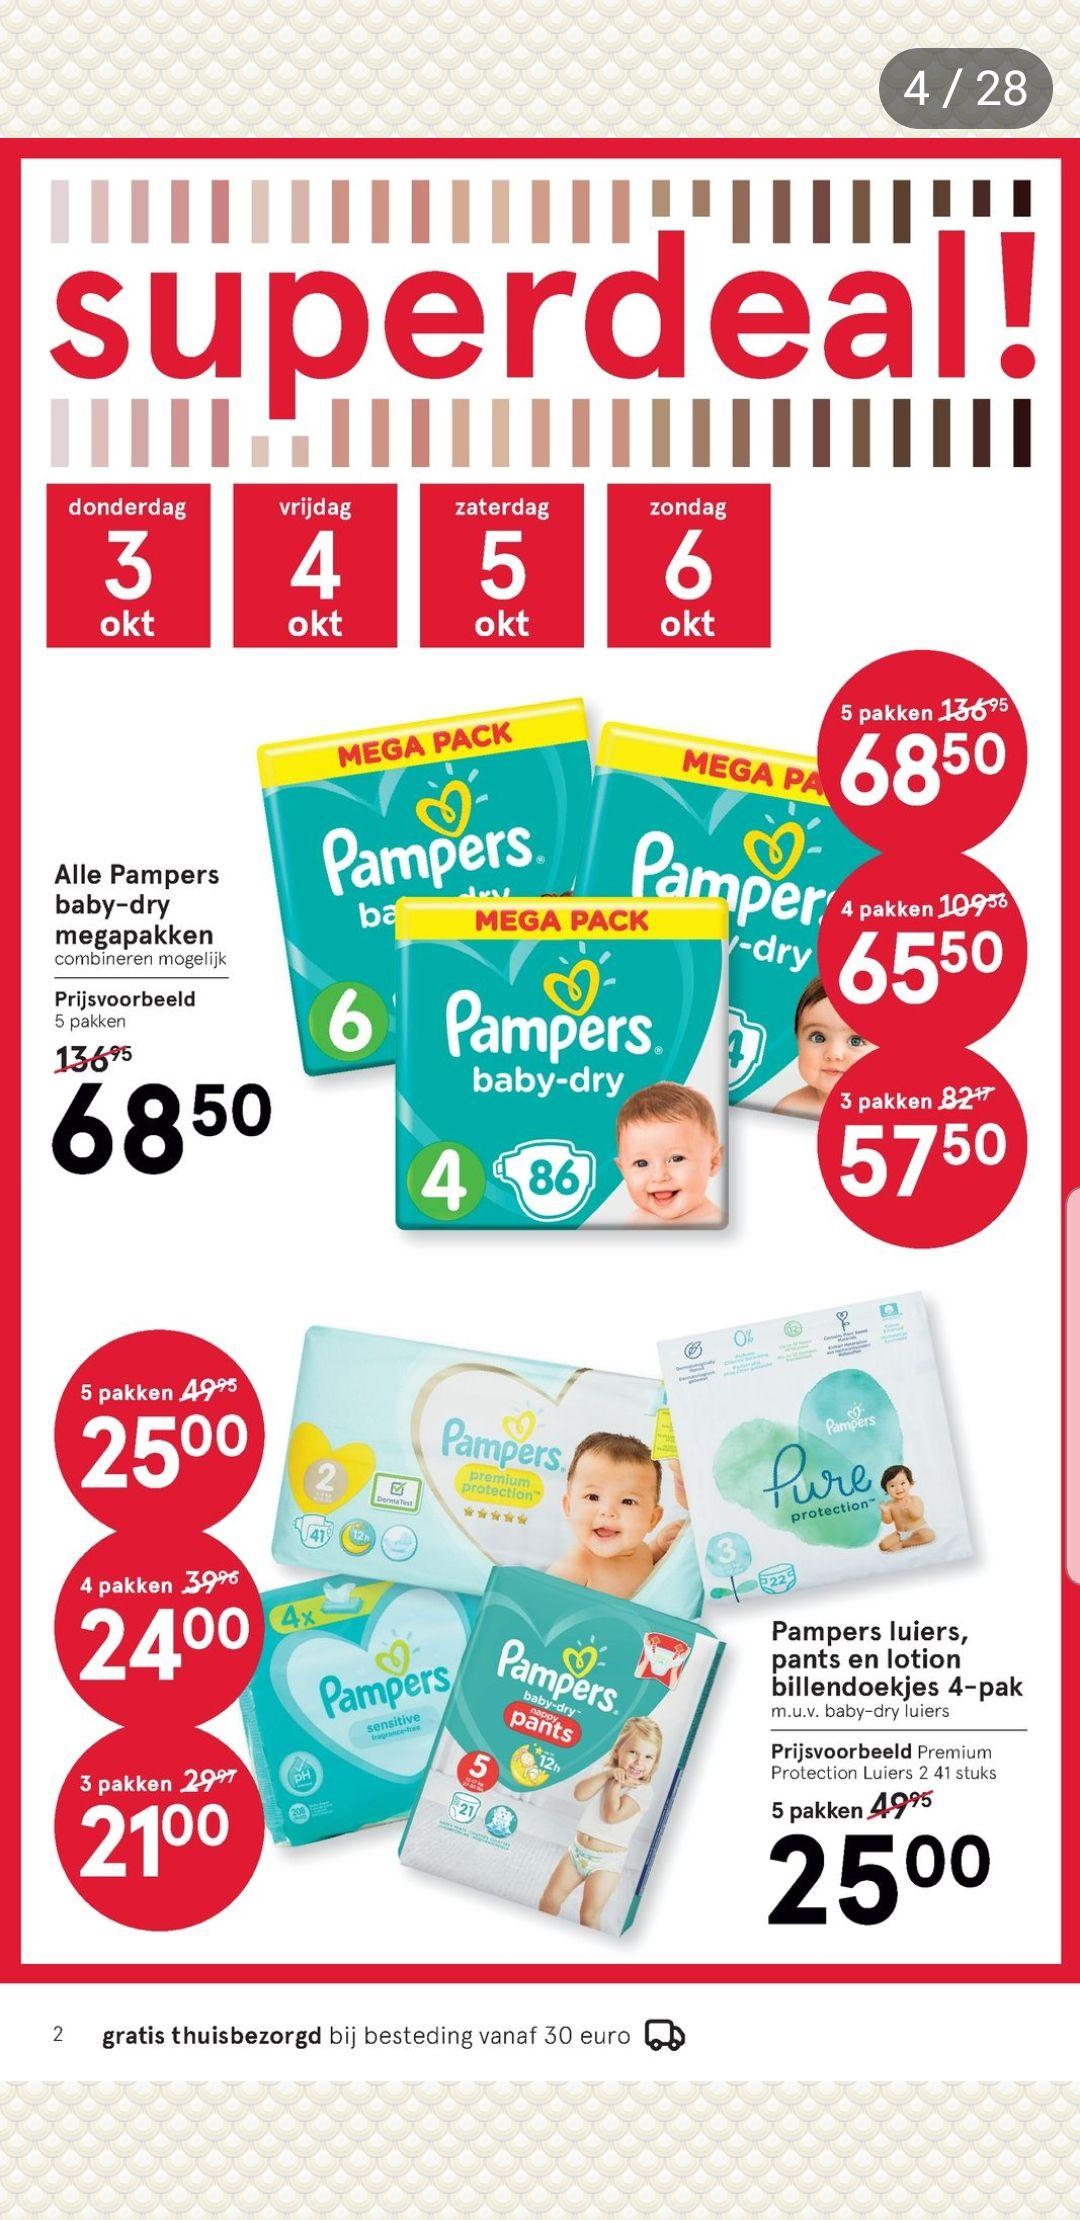 Pampers luiers,pants en lotion billen doekjes (m.u.v. baby dry)